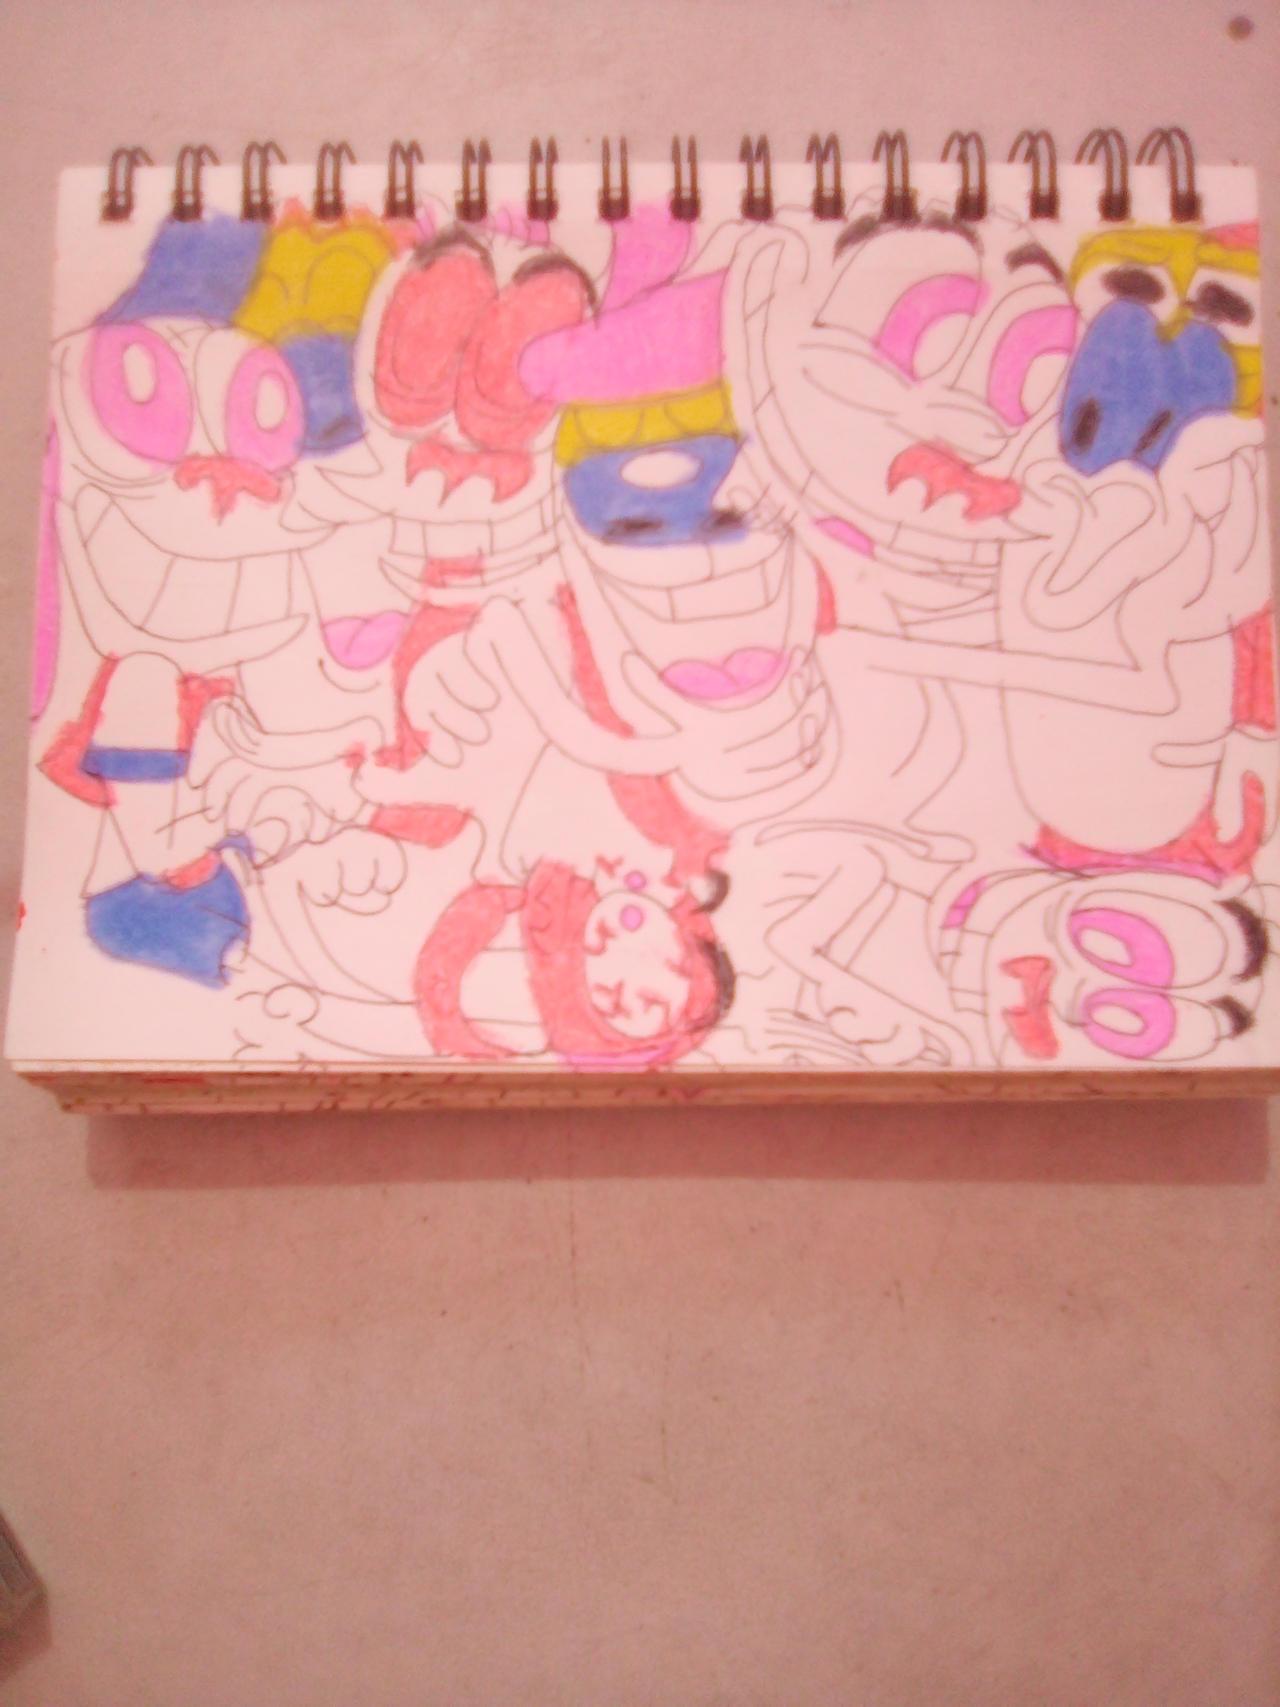 Random Ren and Stimpy drawings 2